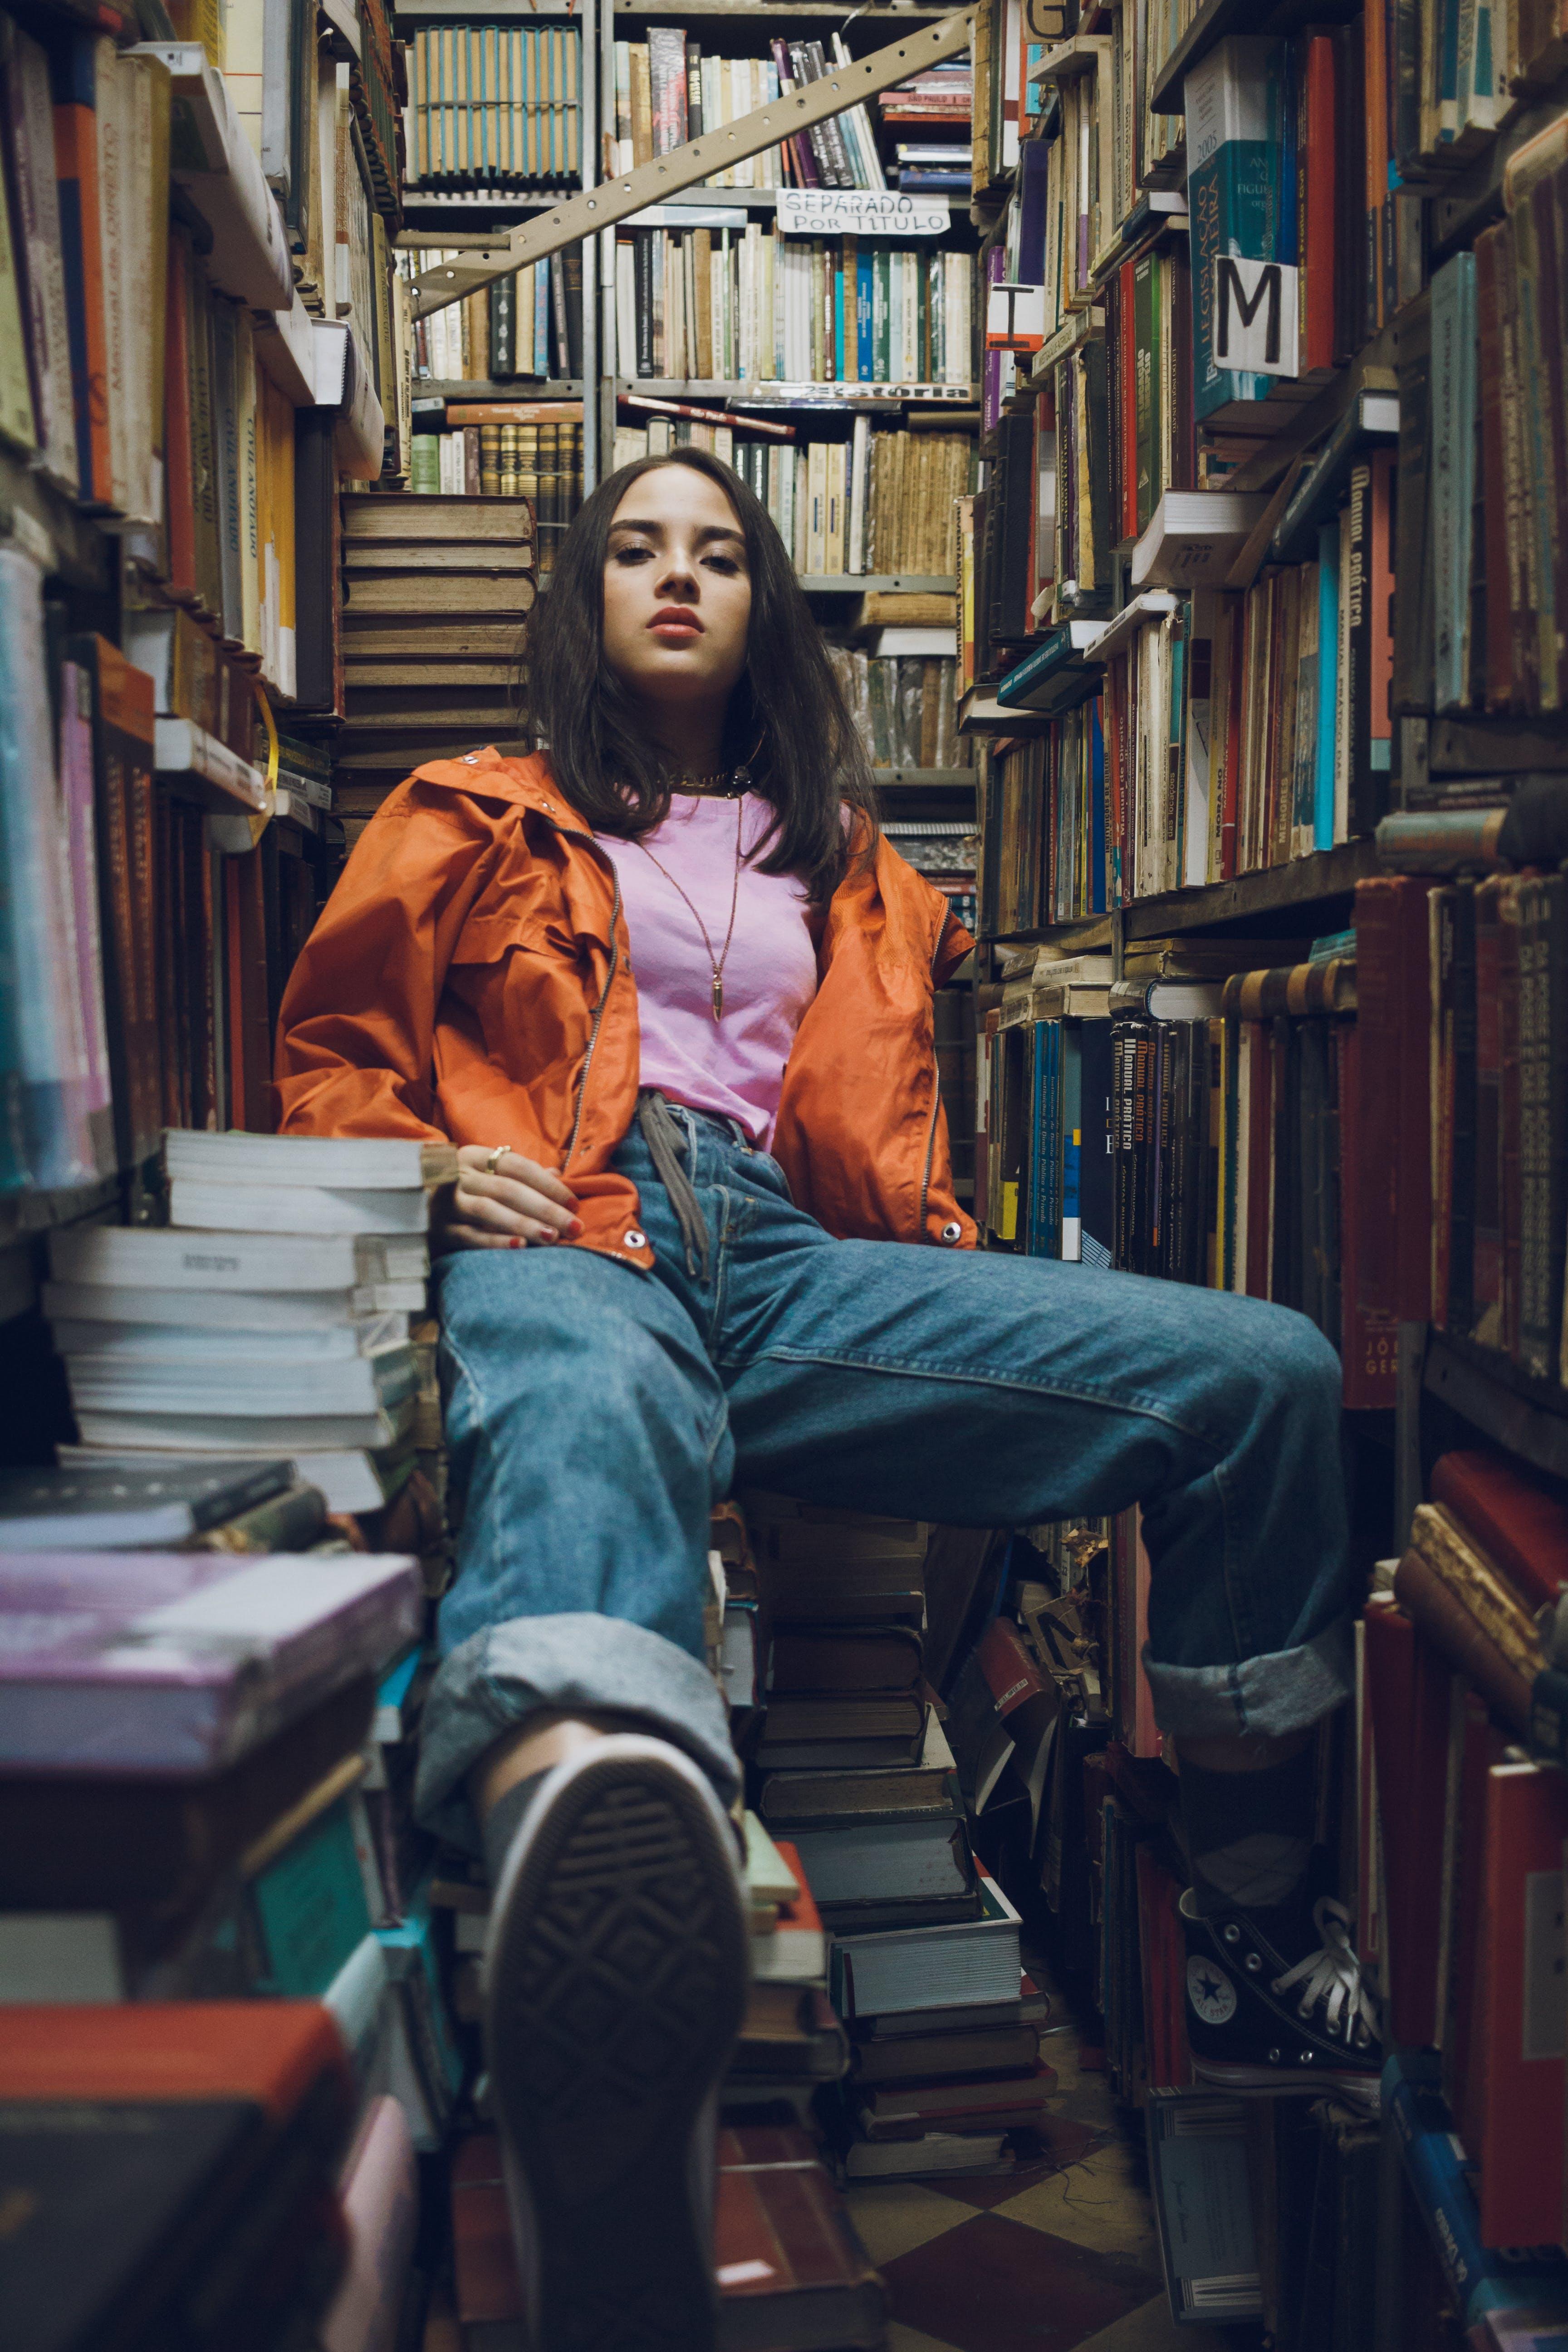 Woman Sitting Between Bookshelves